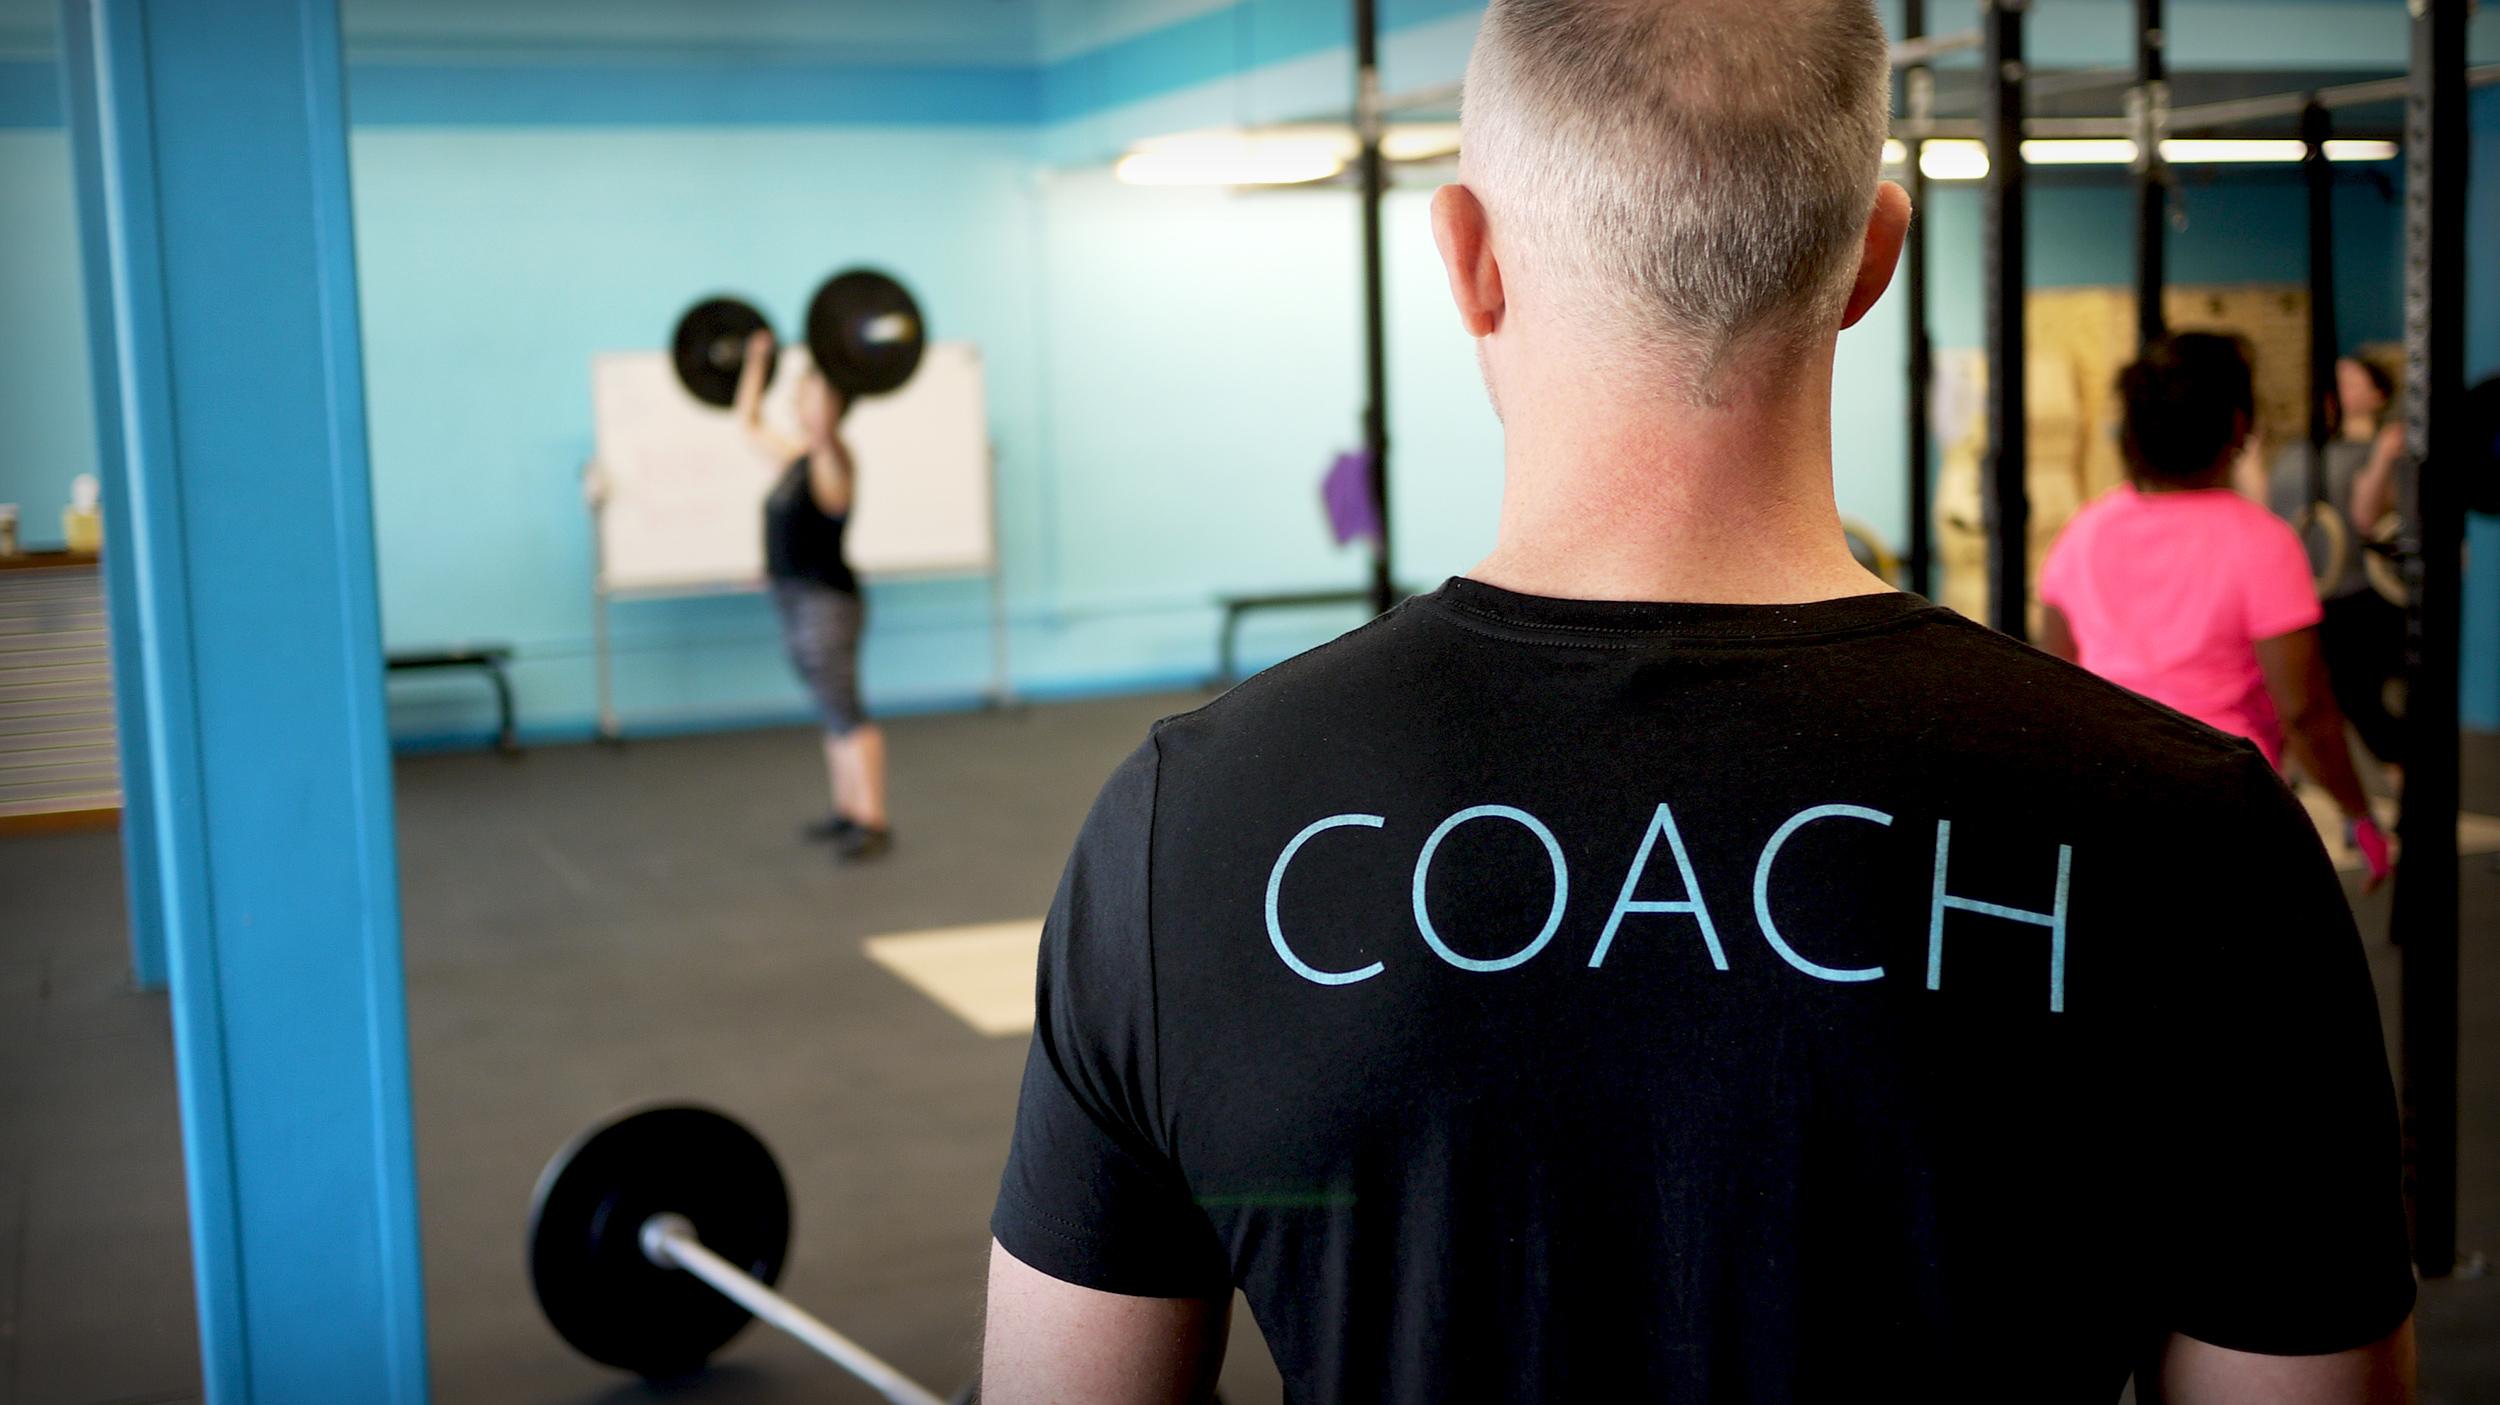 Crossfit Spero coach shirt